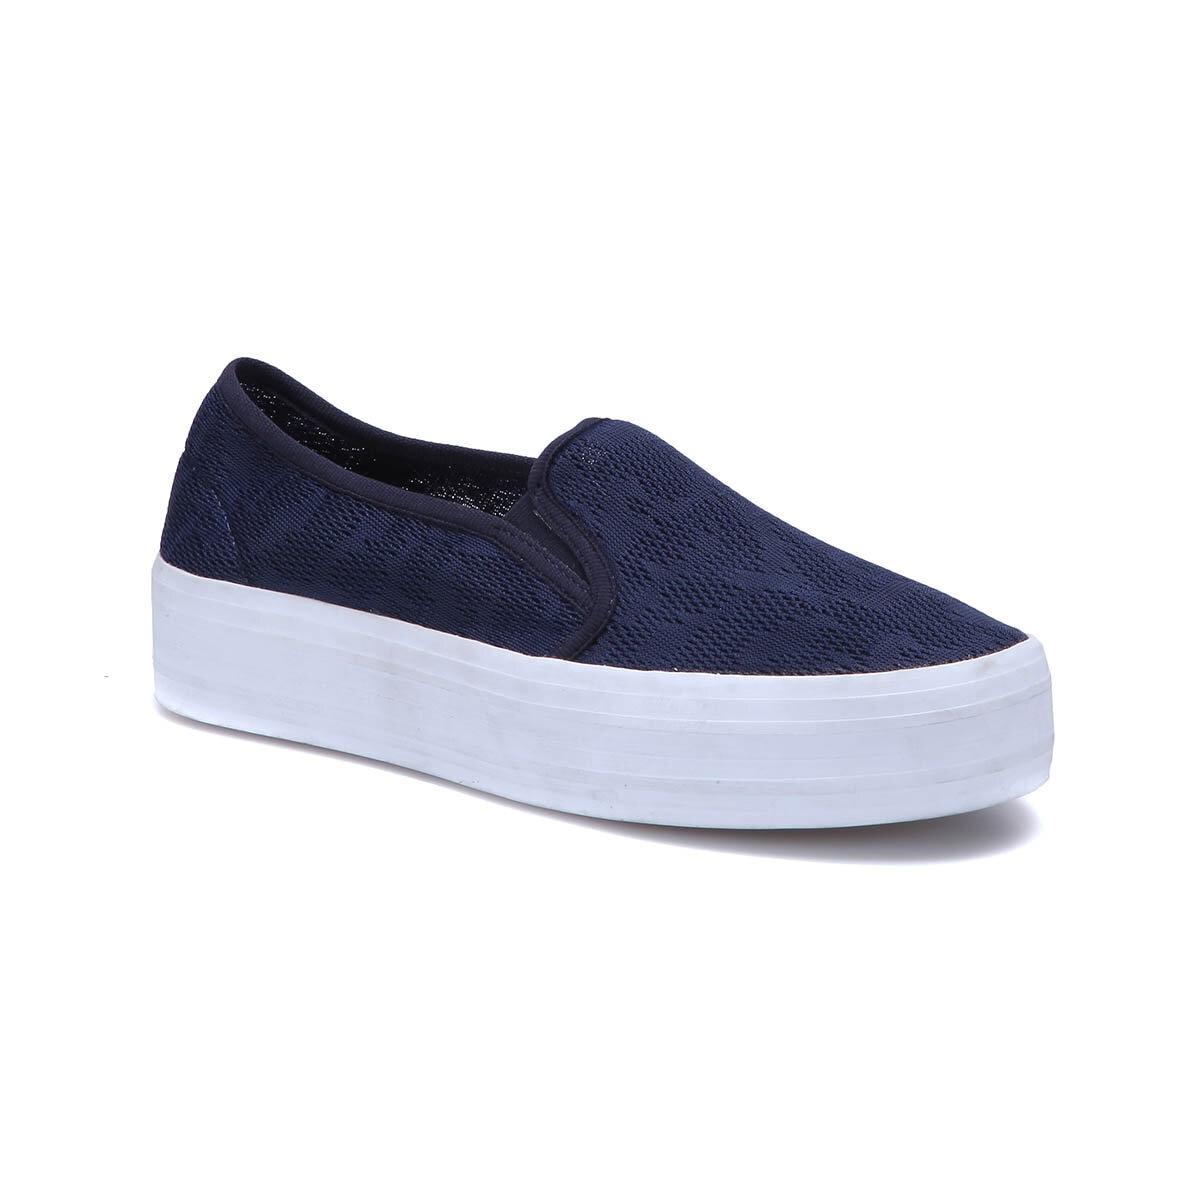 FLO C18032 Navy Blue Women 'S Slip On Shoes Art Bella